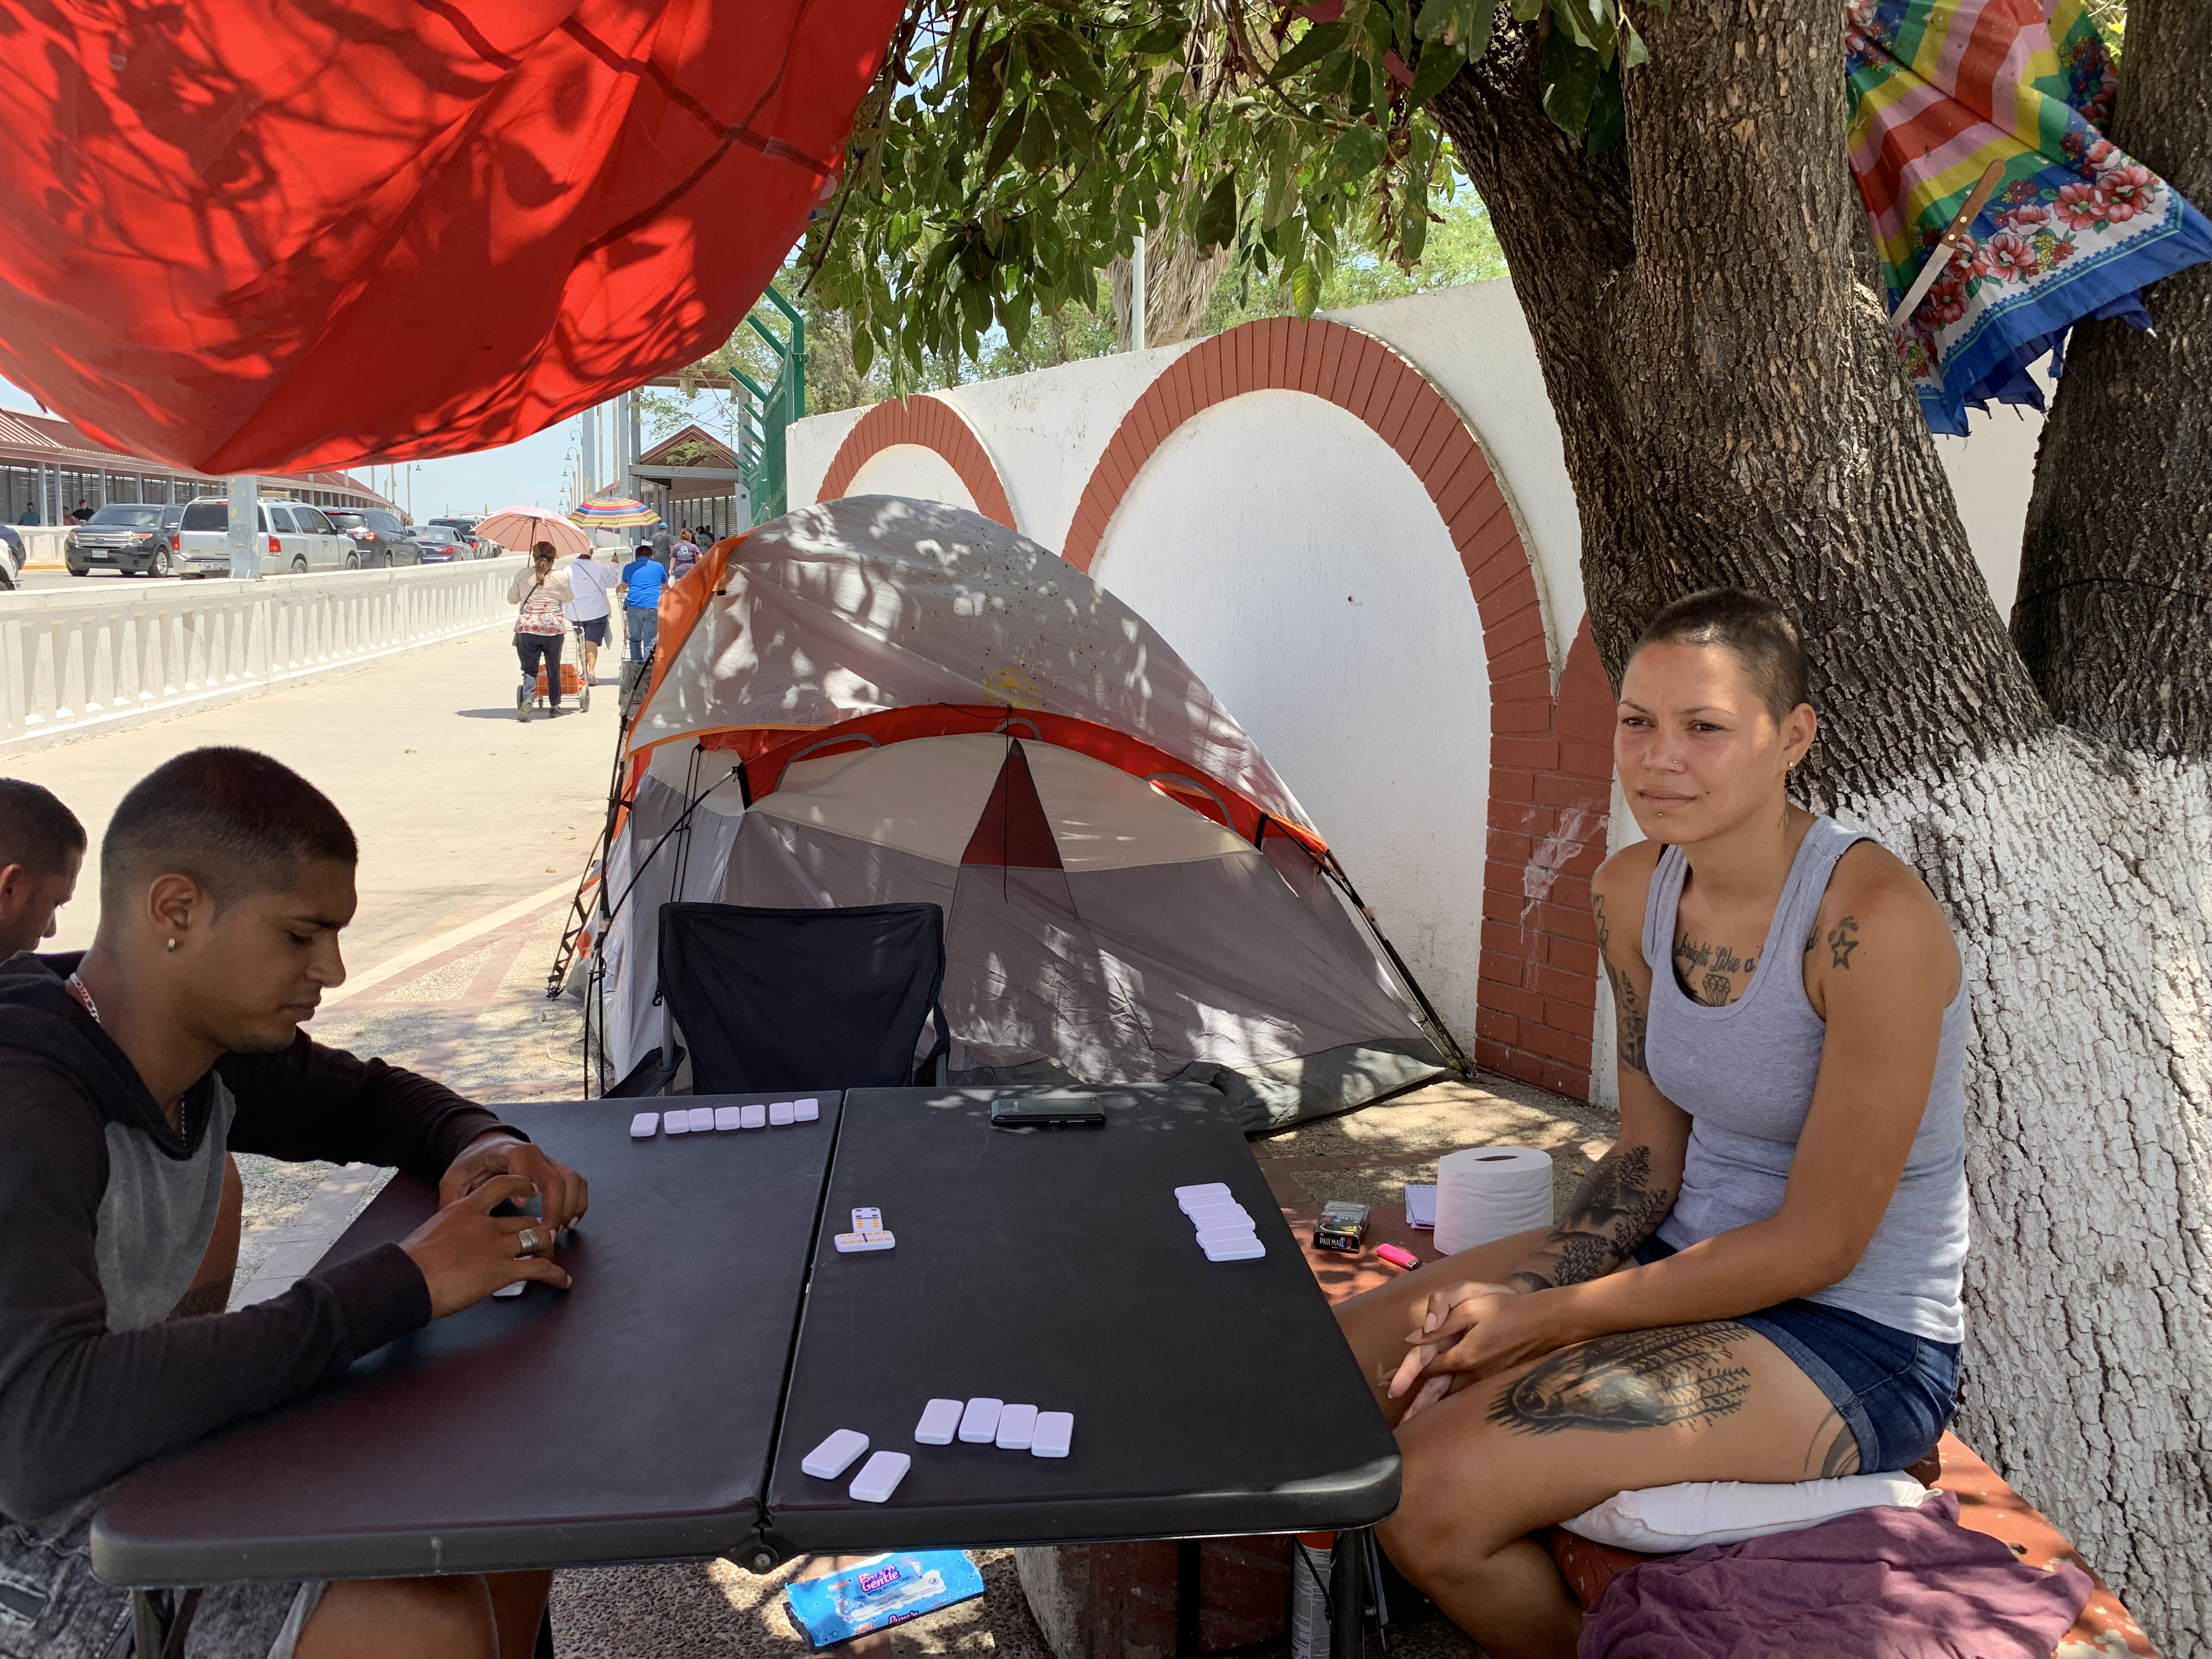 Cubans camp at Nuevo Progreso bridge hoping to claim US asylum